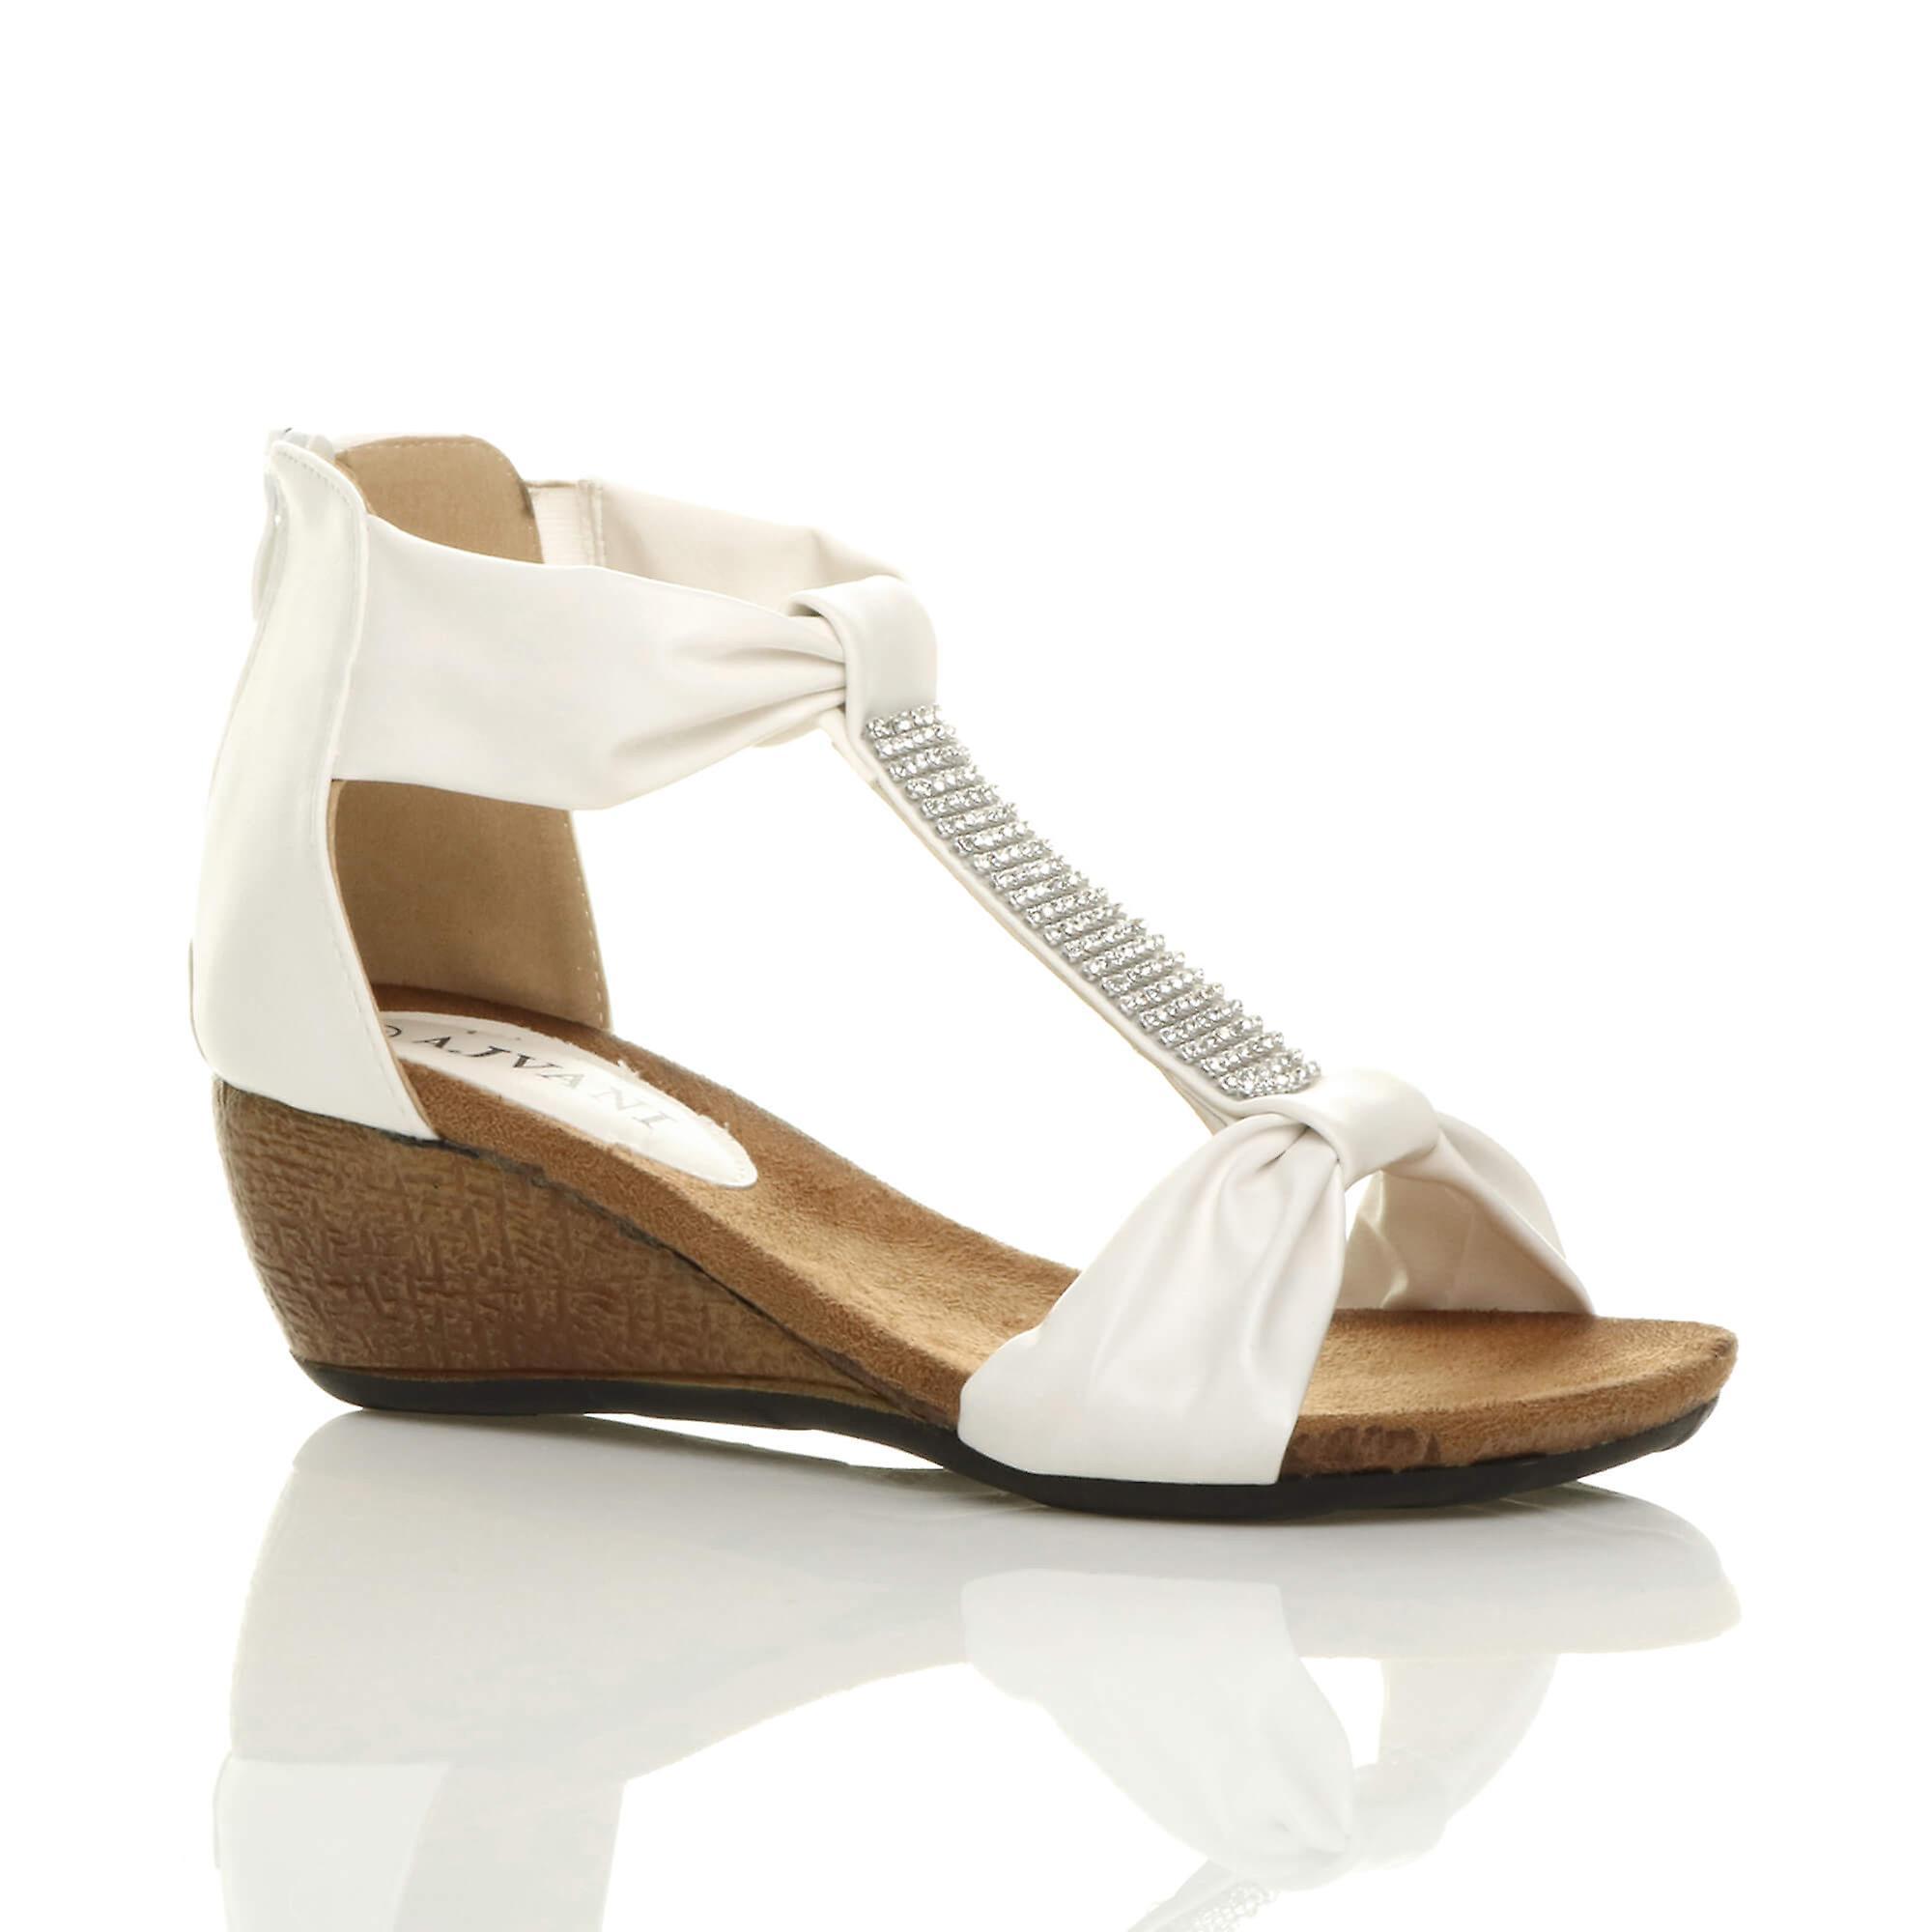 Ajvani Womens Mitte Fußbett Keil Zip t-Bar Diamante Sommer Sandalen Schuhe